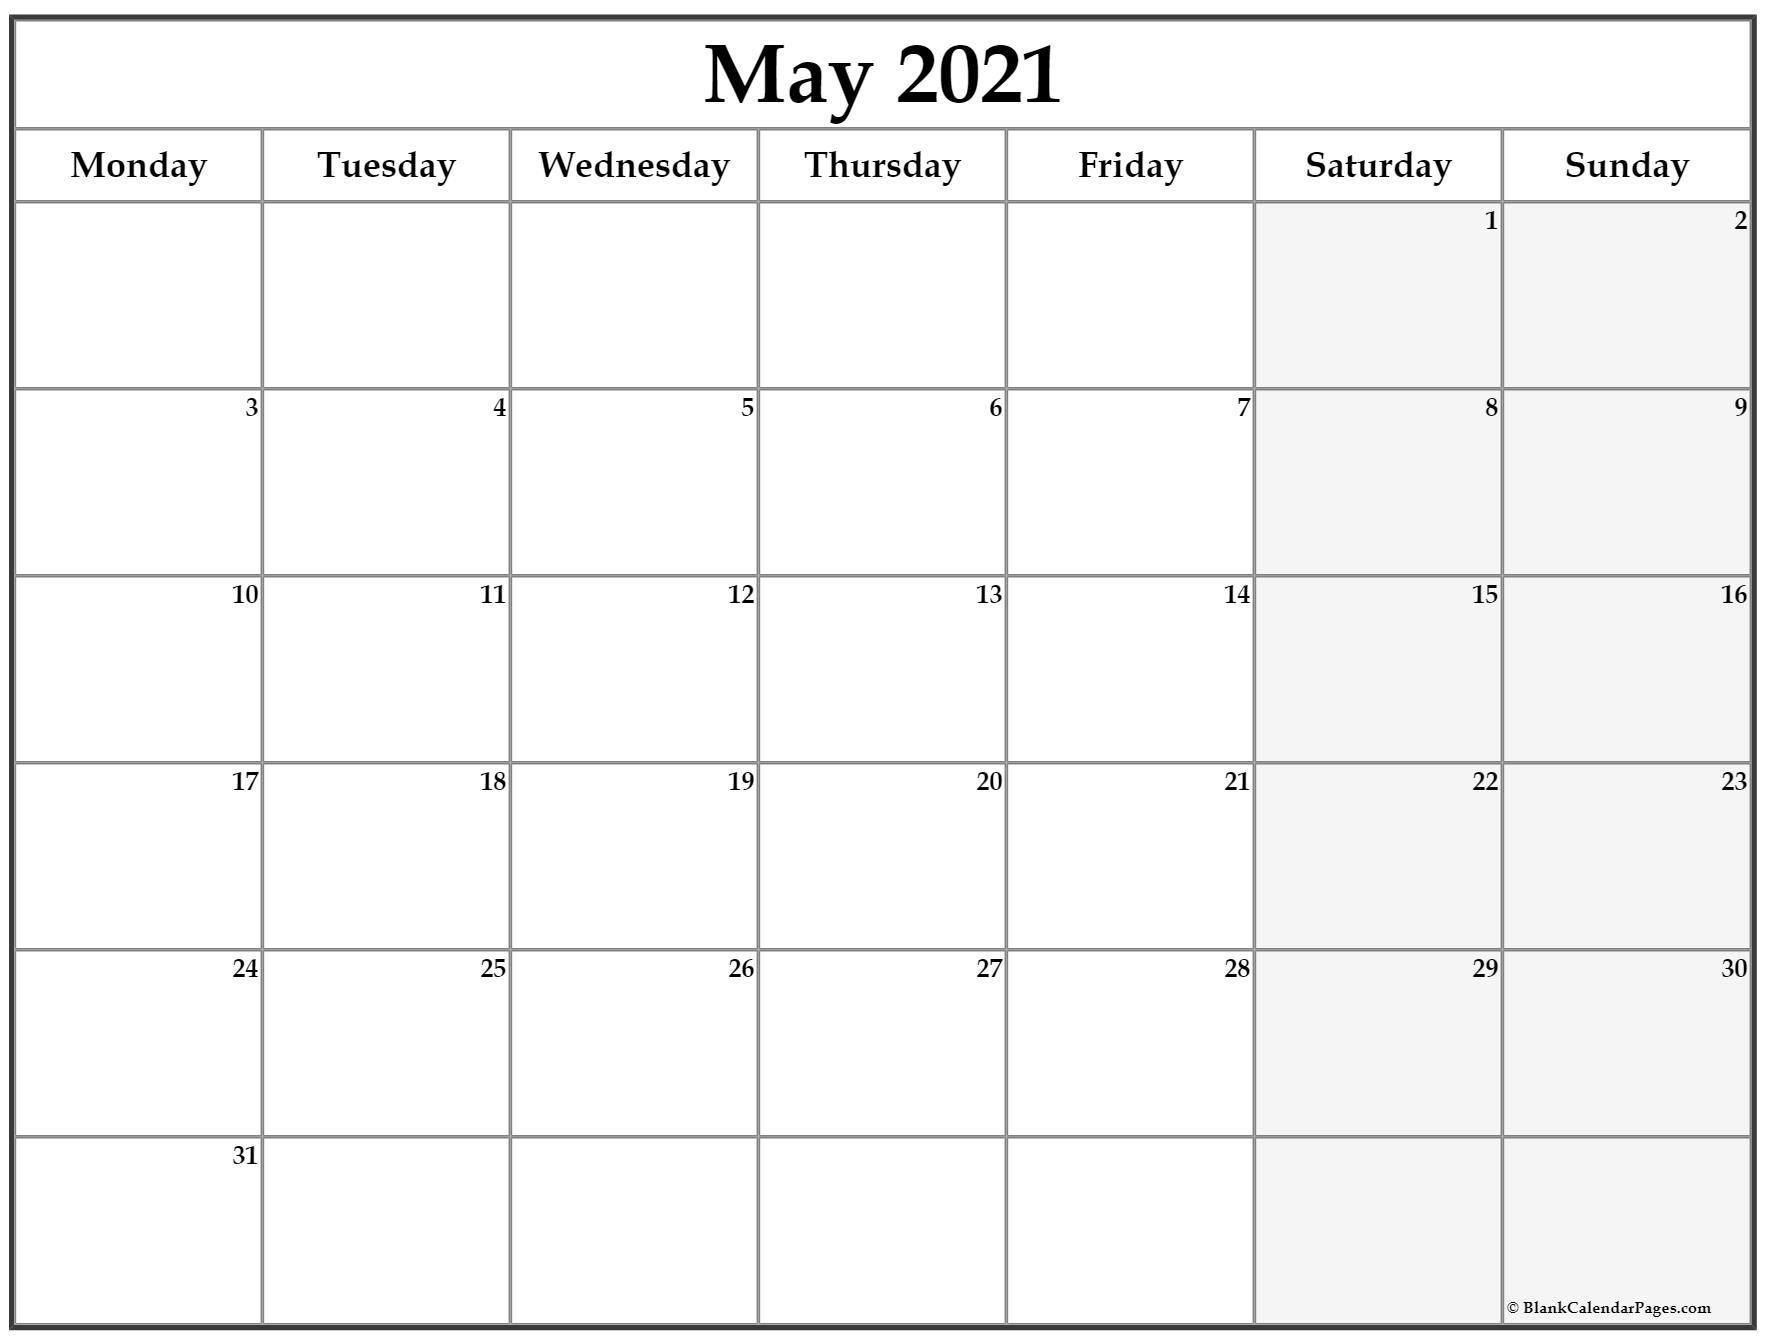 May 2021 Monday Calendar | Monday To Sunday-Sunday To Saturday Calendar 2021 Printable